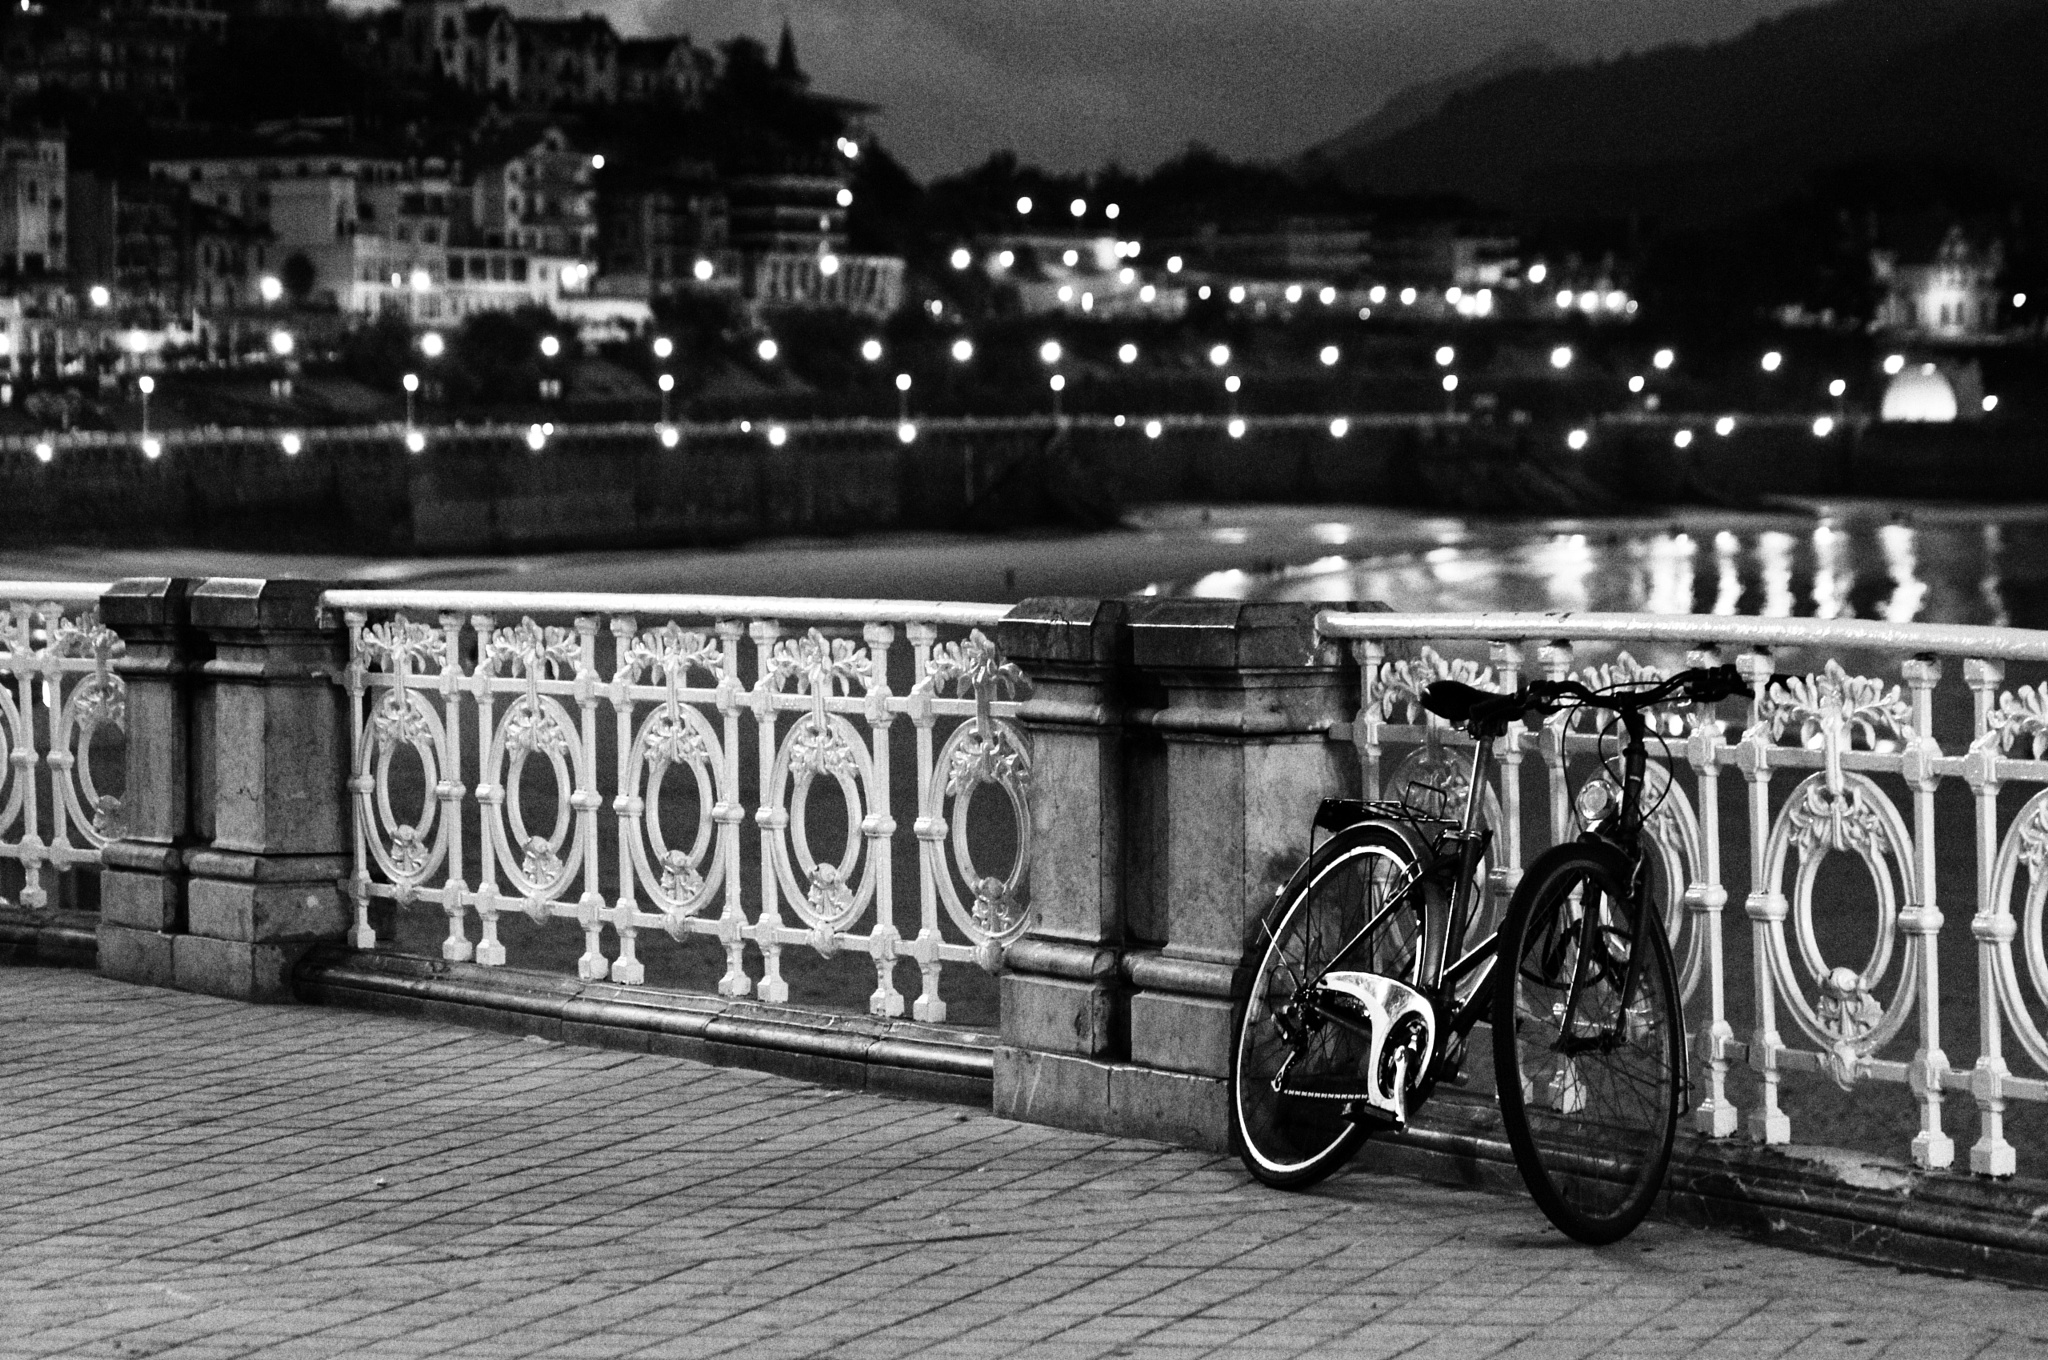 la bicyclette by EmilyBy